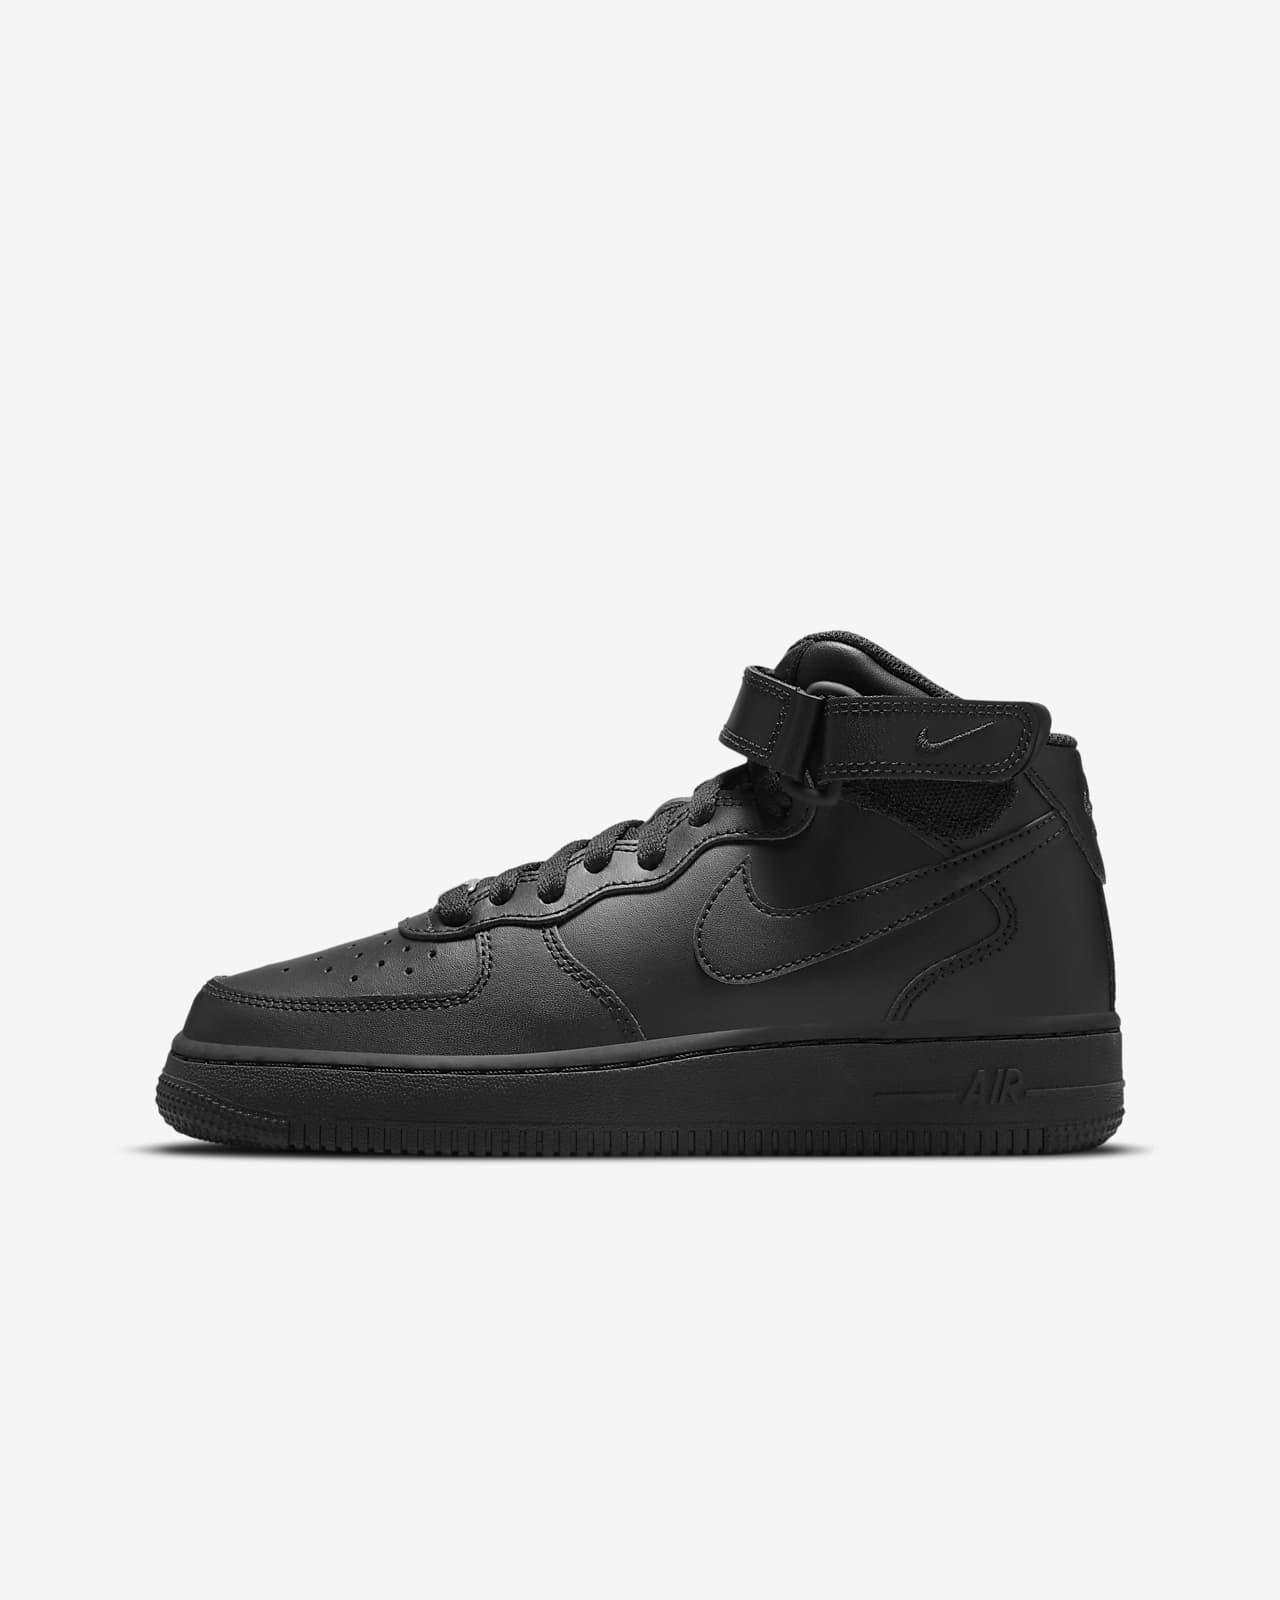 Nike Air Force 1 Mid LE Schuh für ältere Kinder